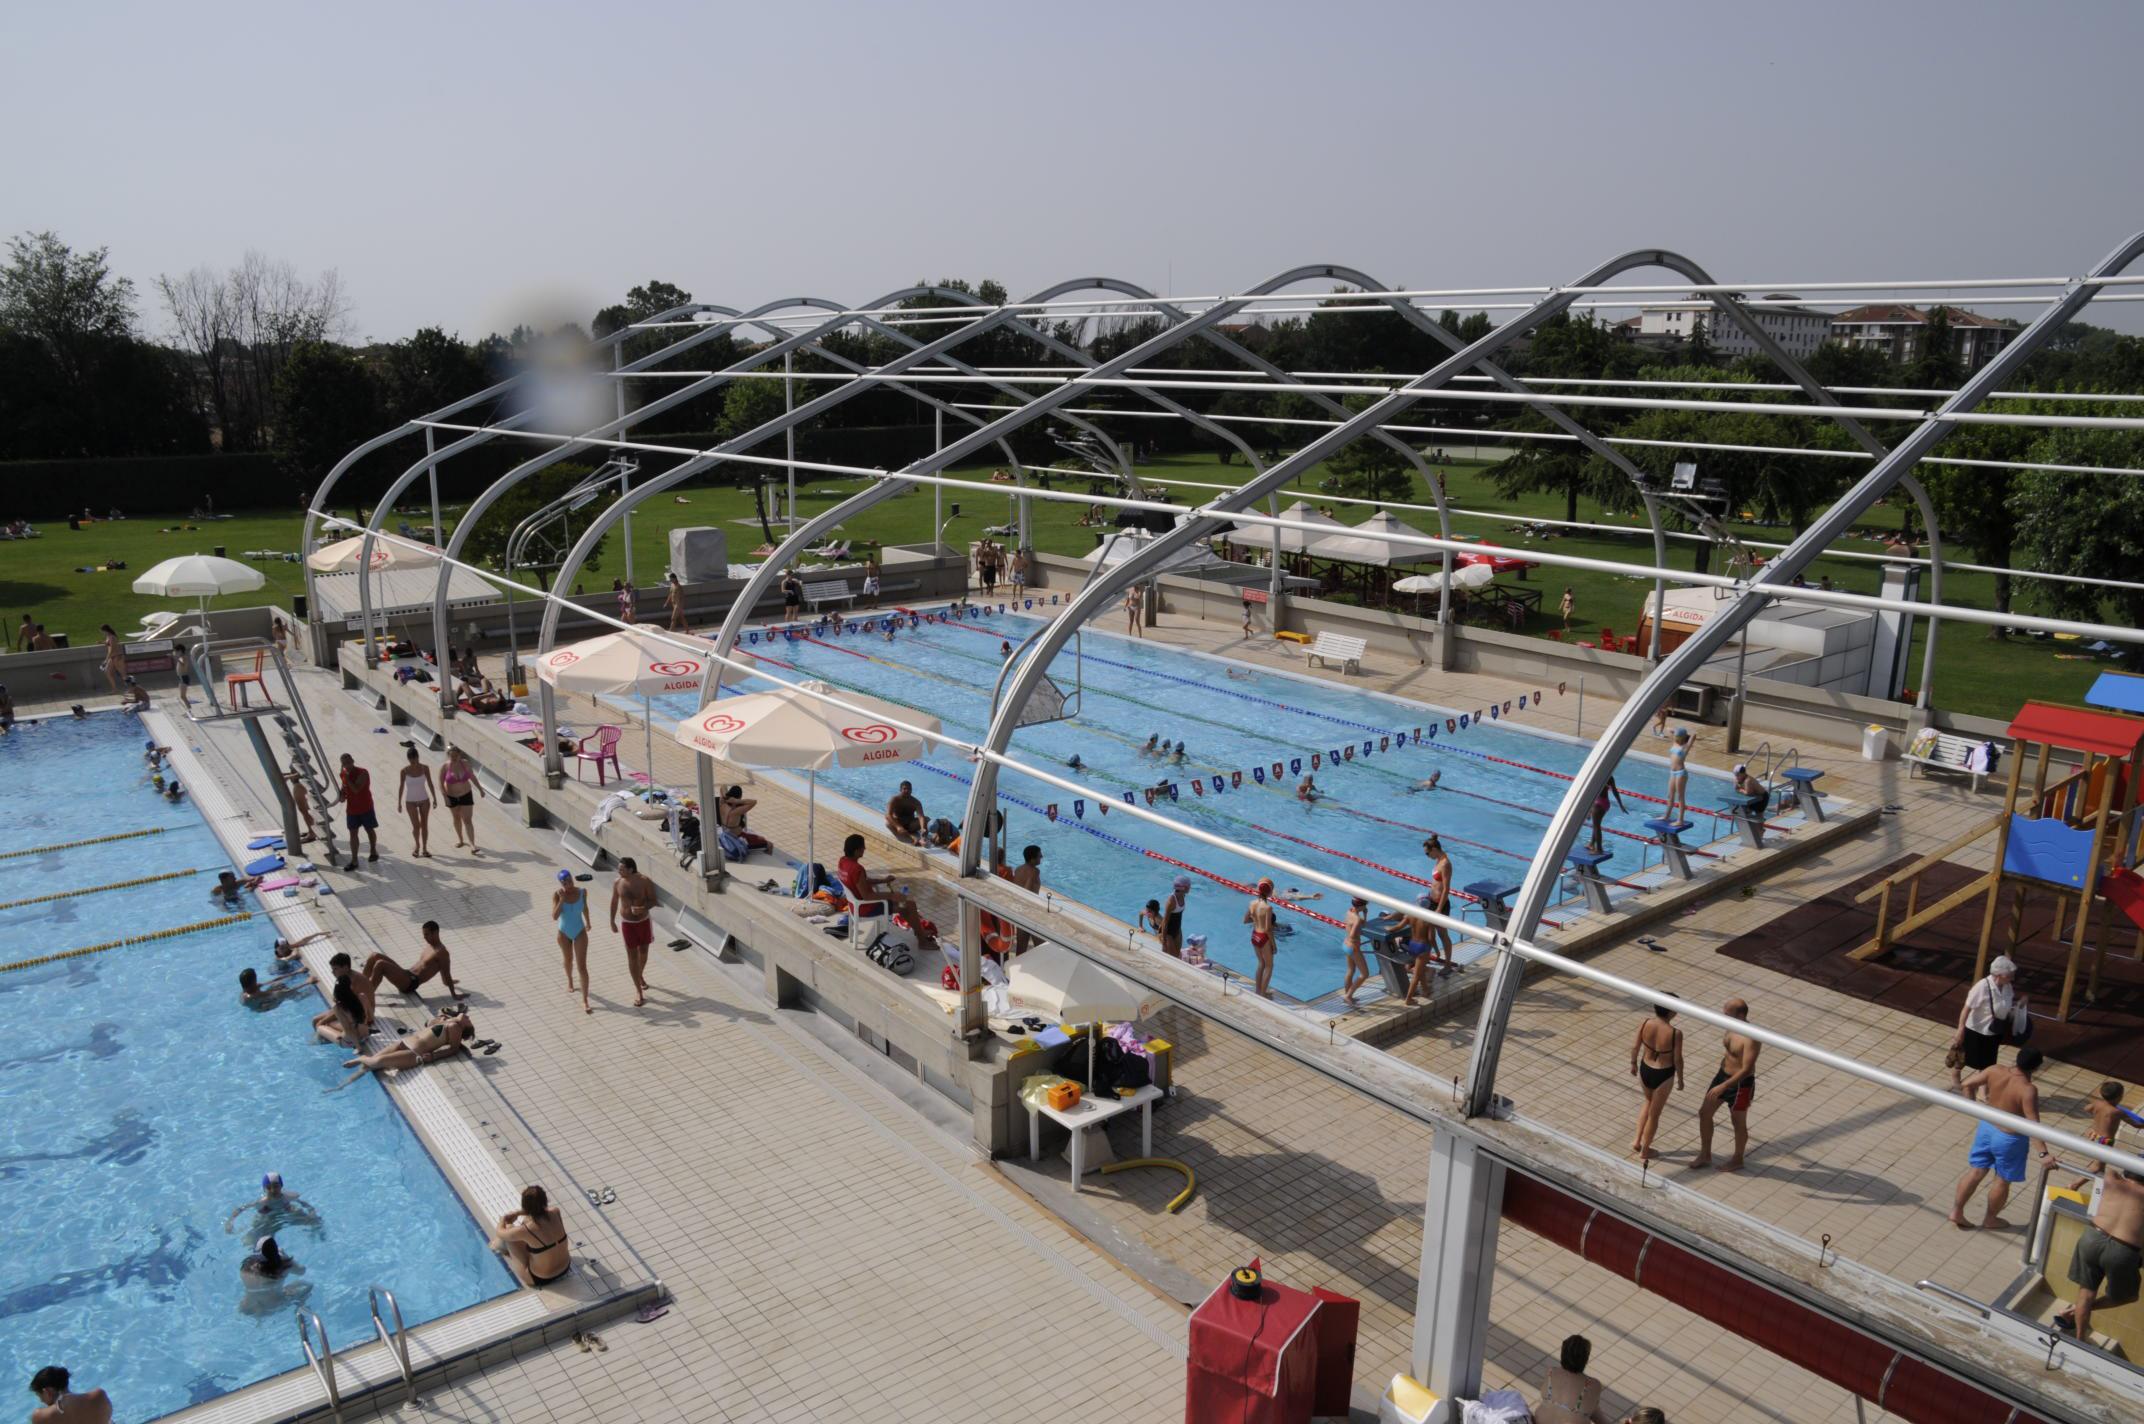 Corsi - Piscina valdobbiadene orari nuoto libero ...